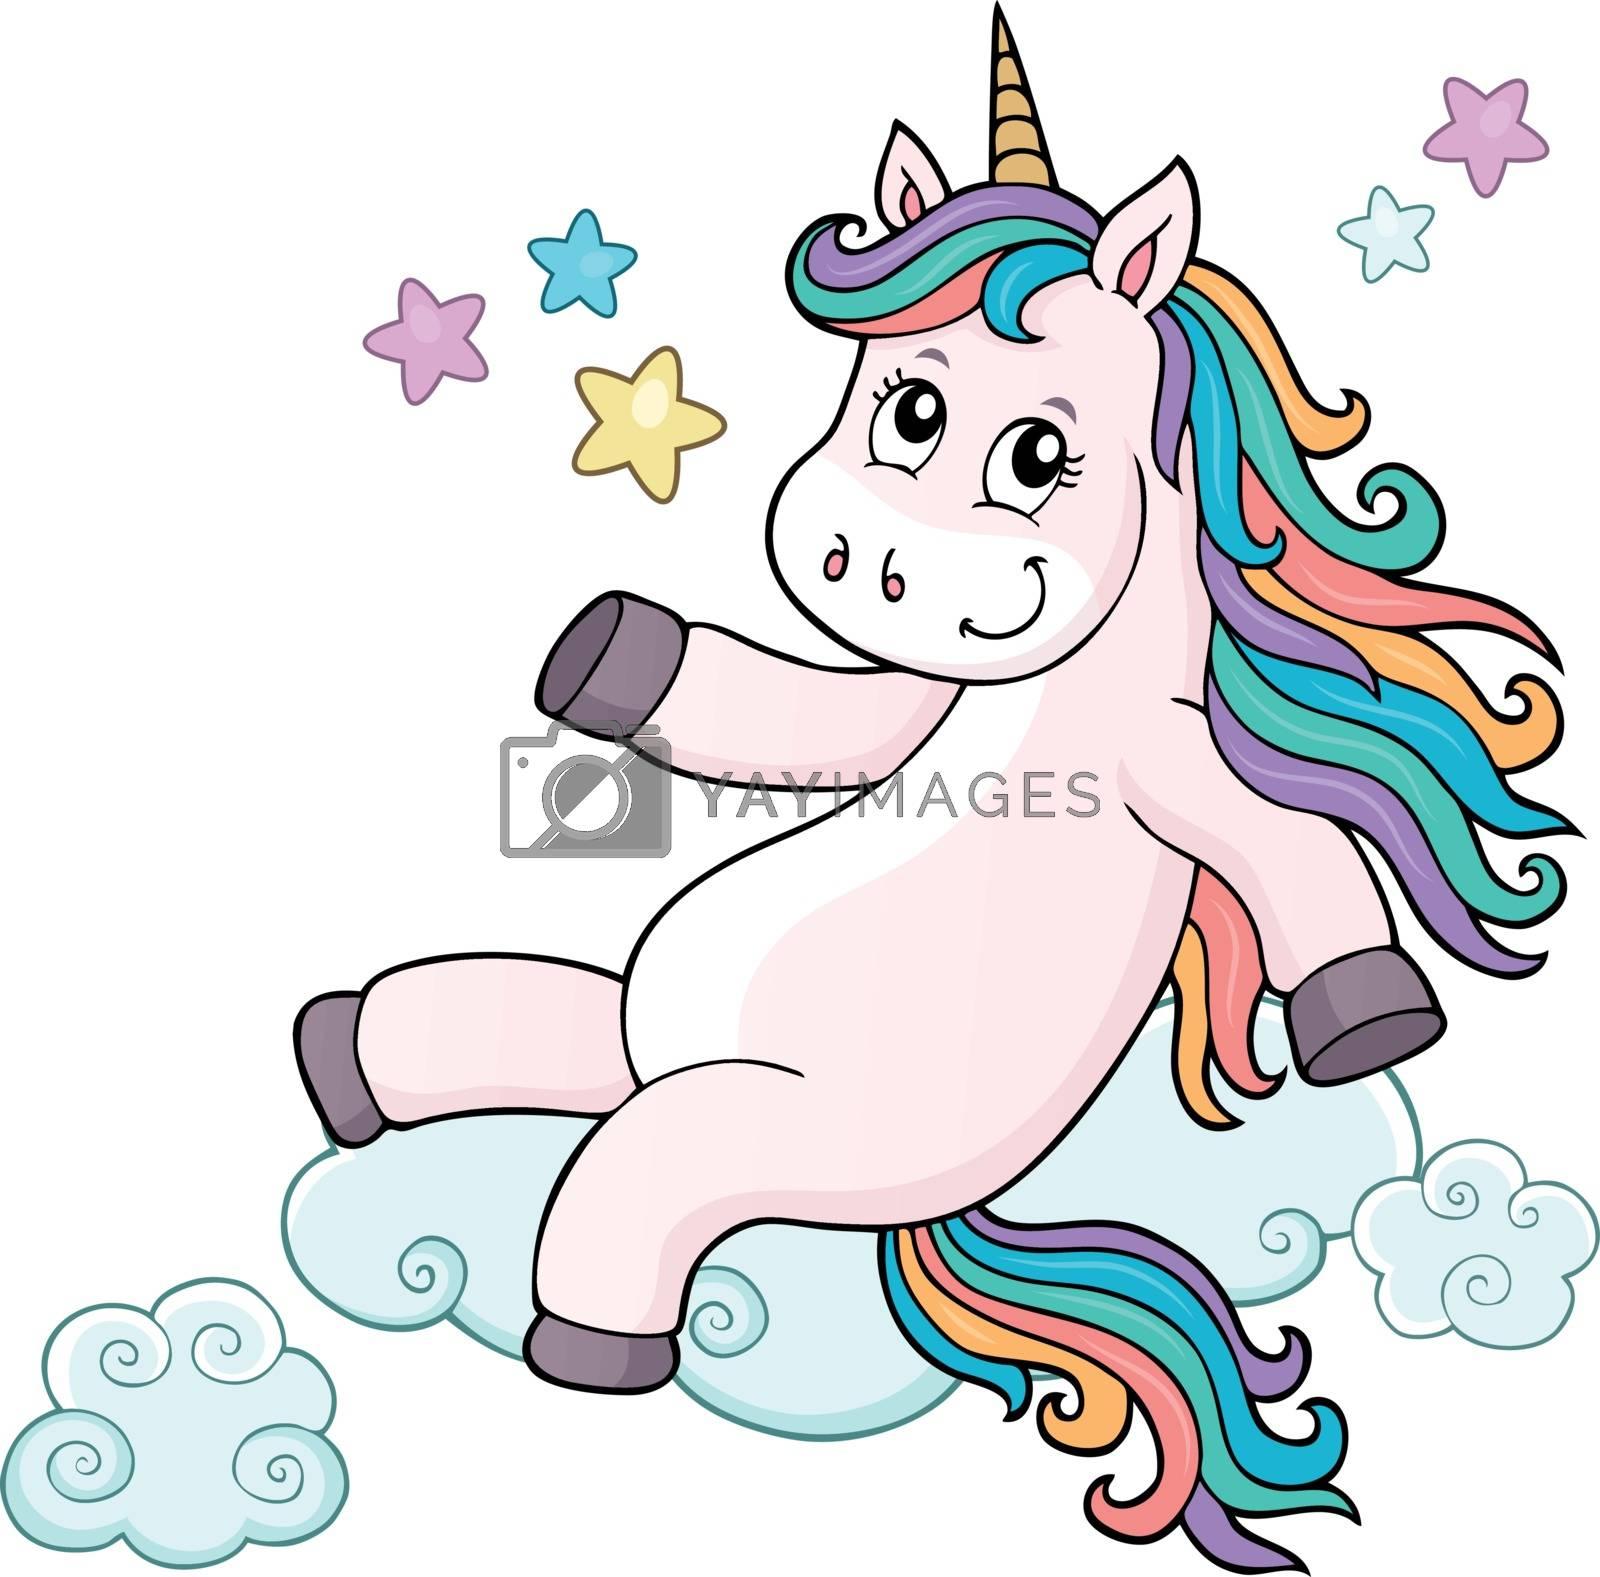 Cute unicorn topic image 7 - eps10 vector illustration.